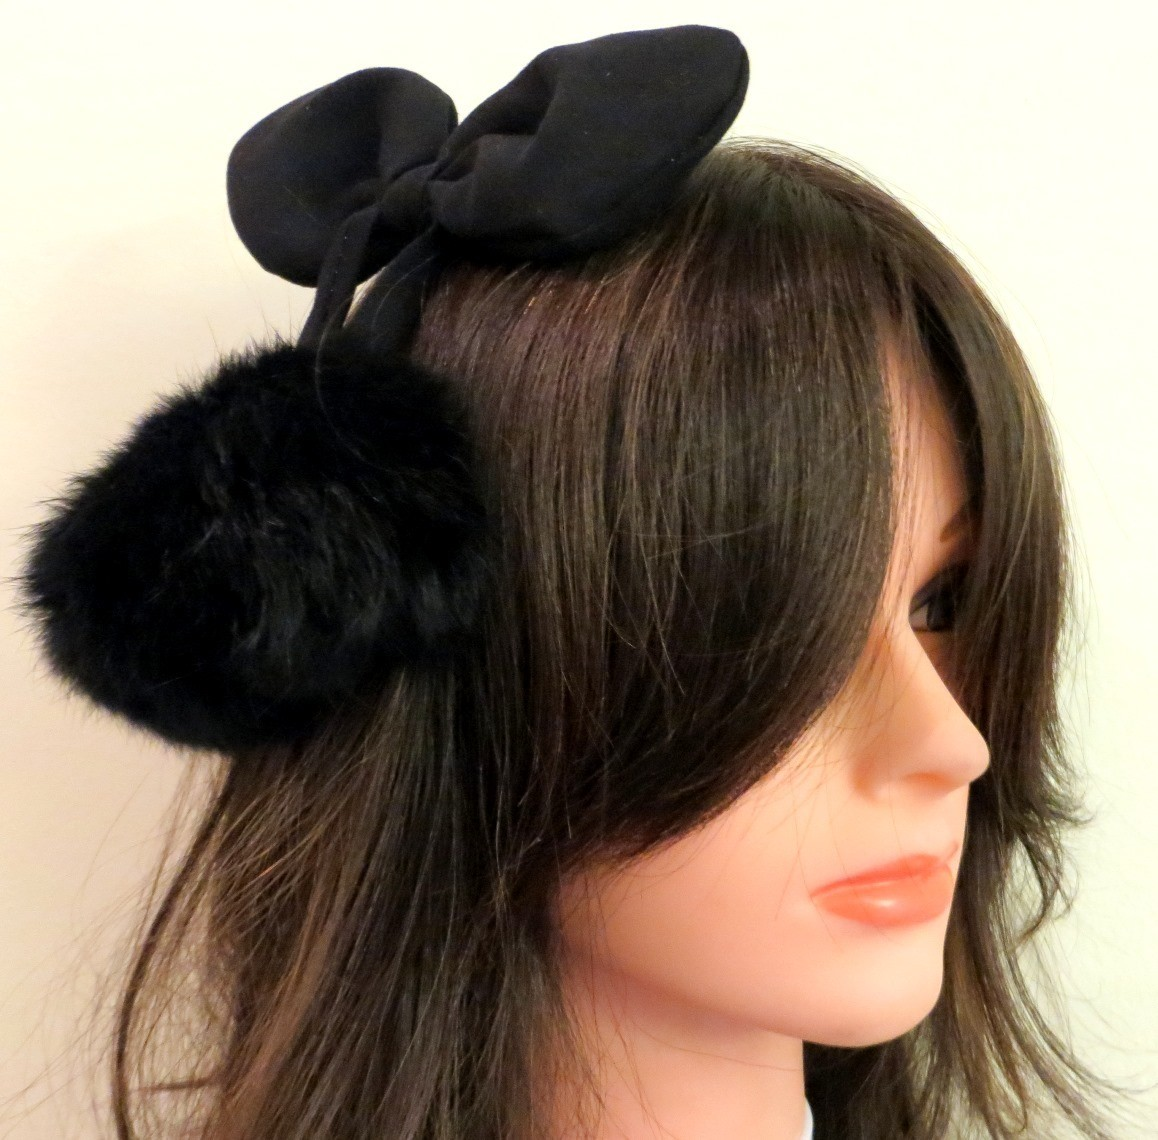 Black bow and fur ball headband